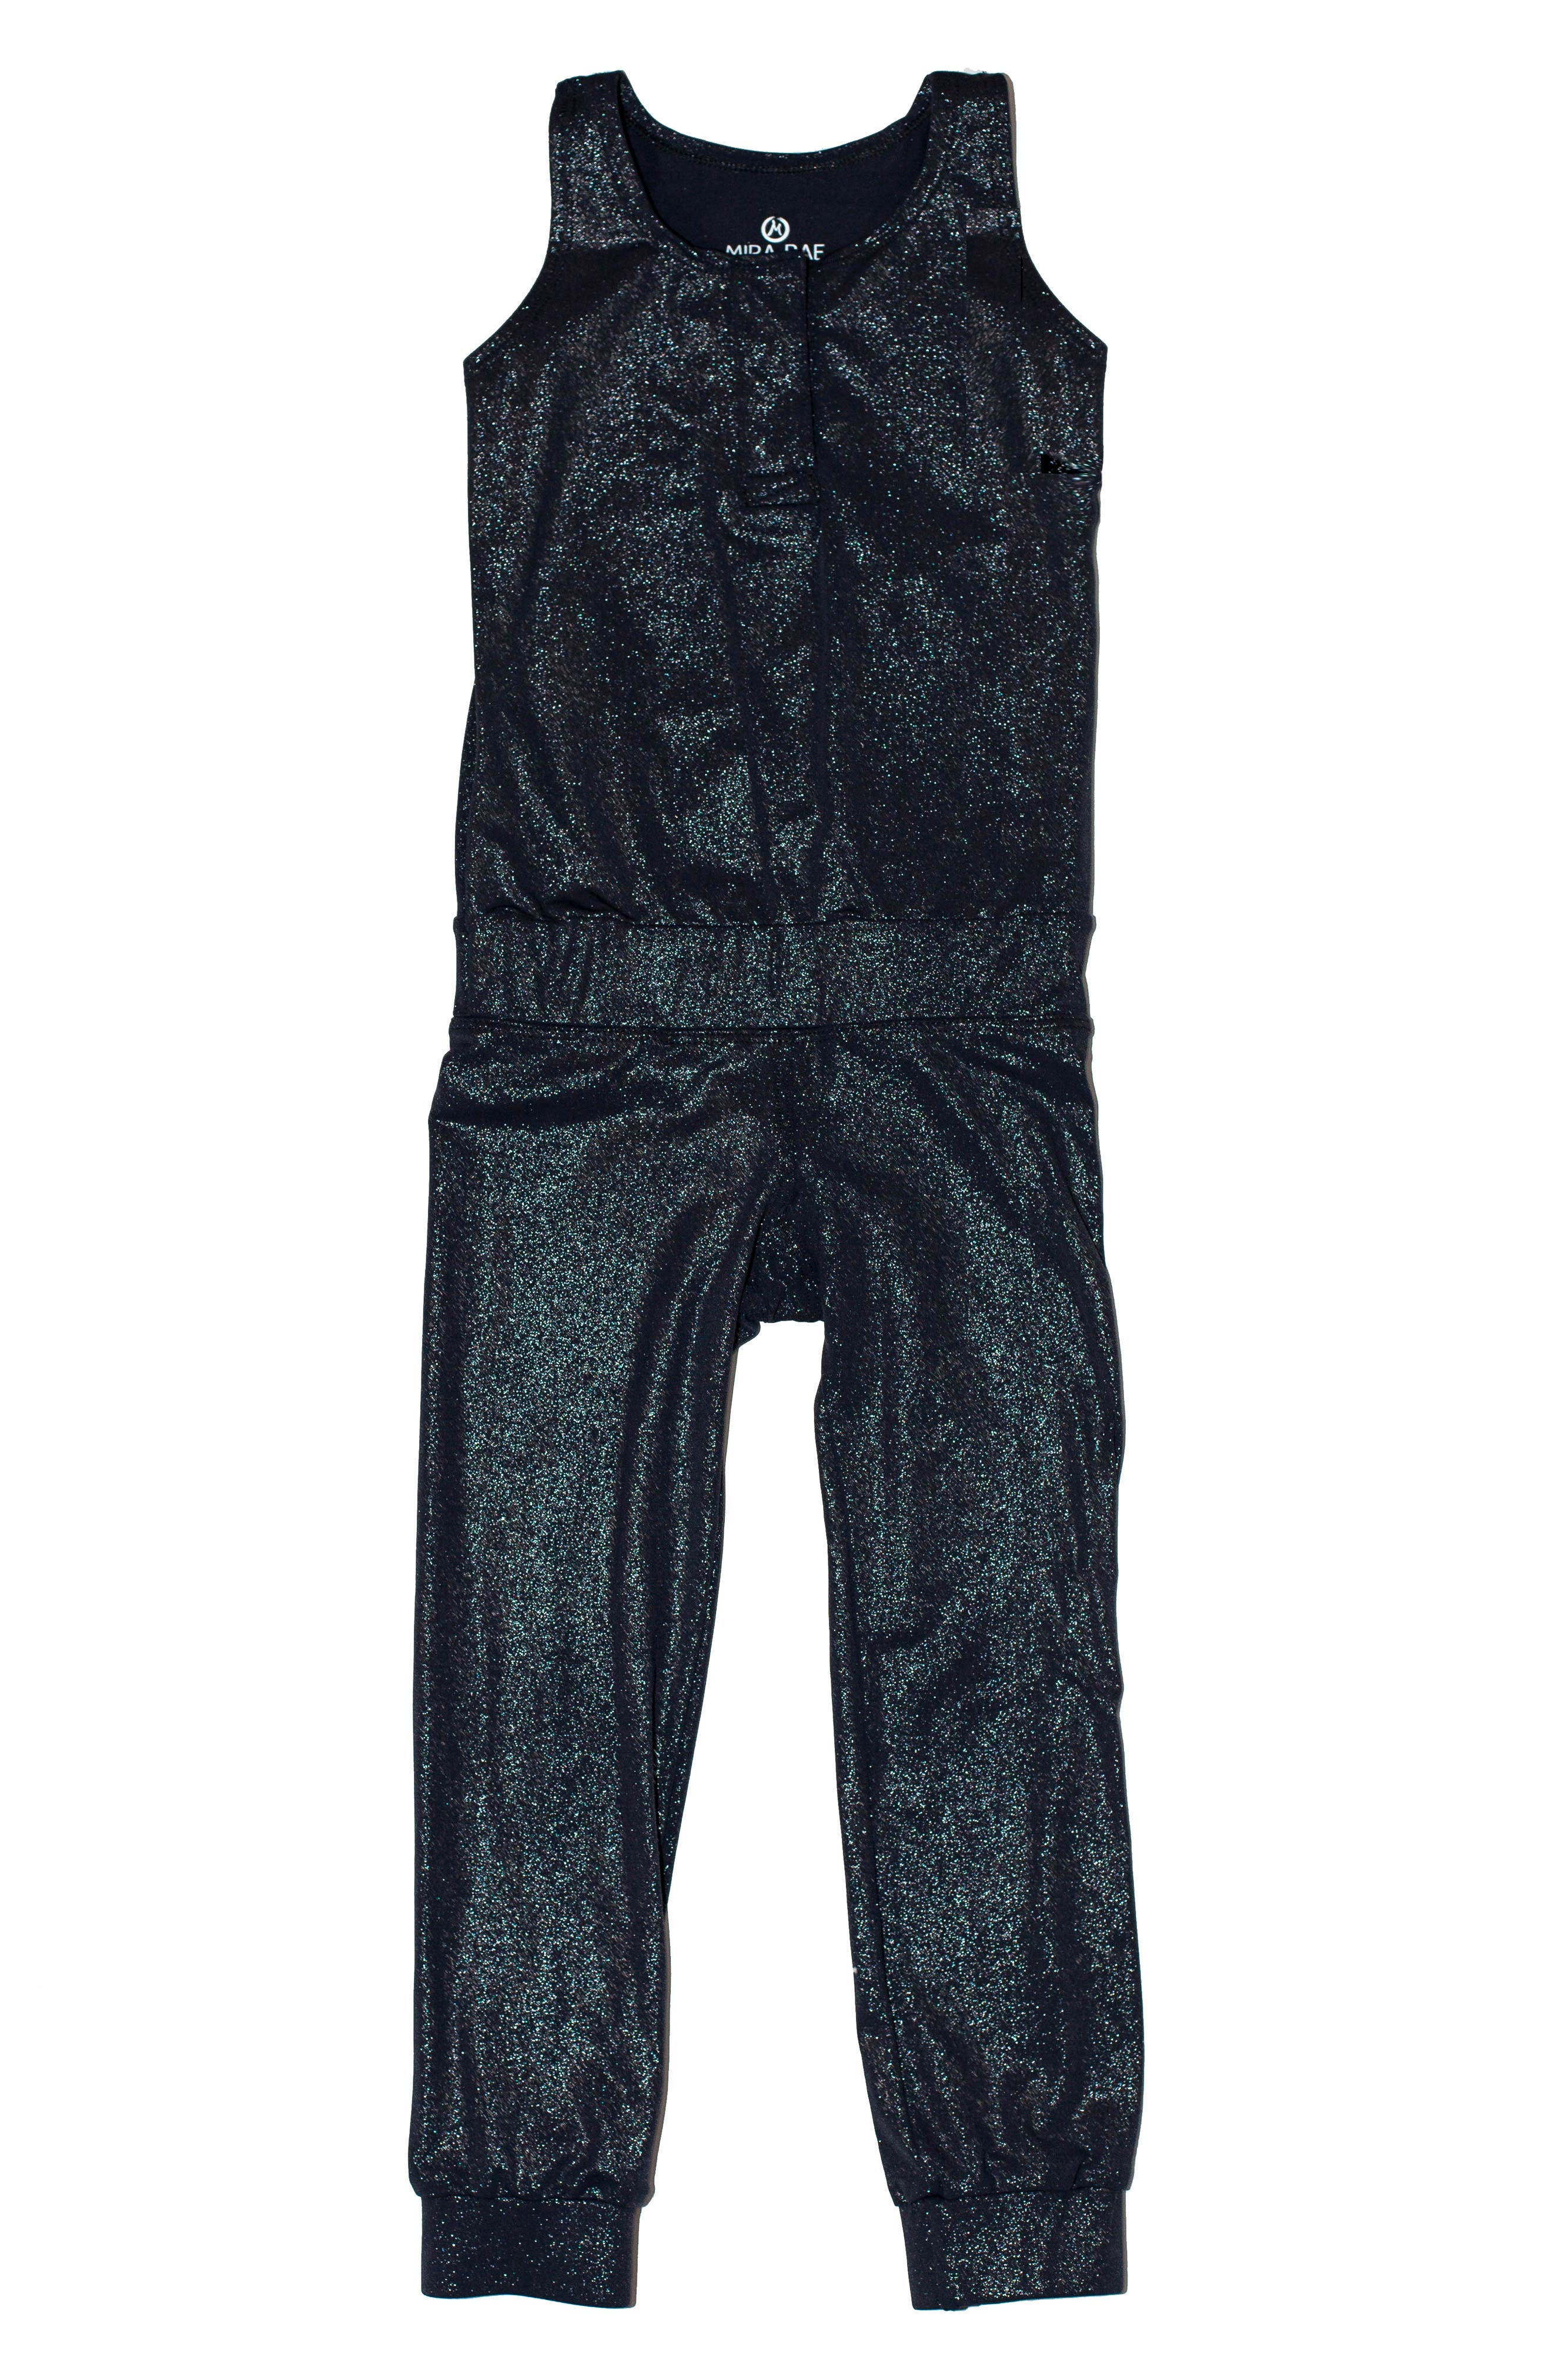 MIRA RAE, Riya Metallic Jumpsuit, Main thumbnail 1, color, MOONLESS NIGHT